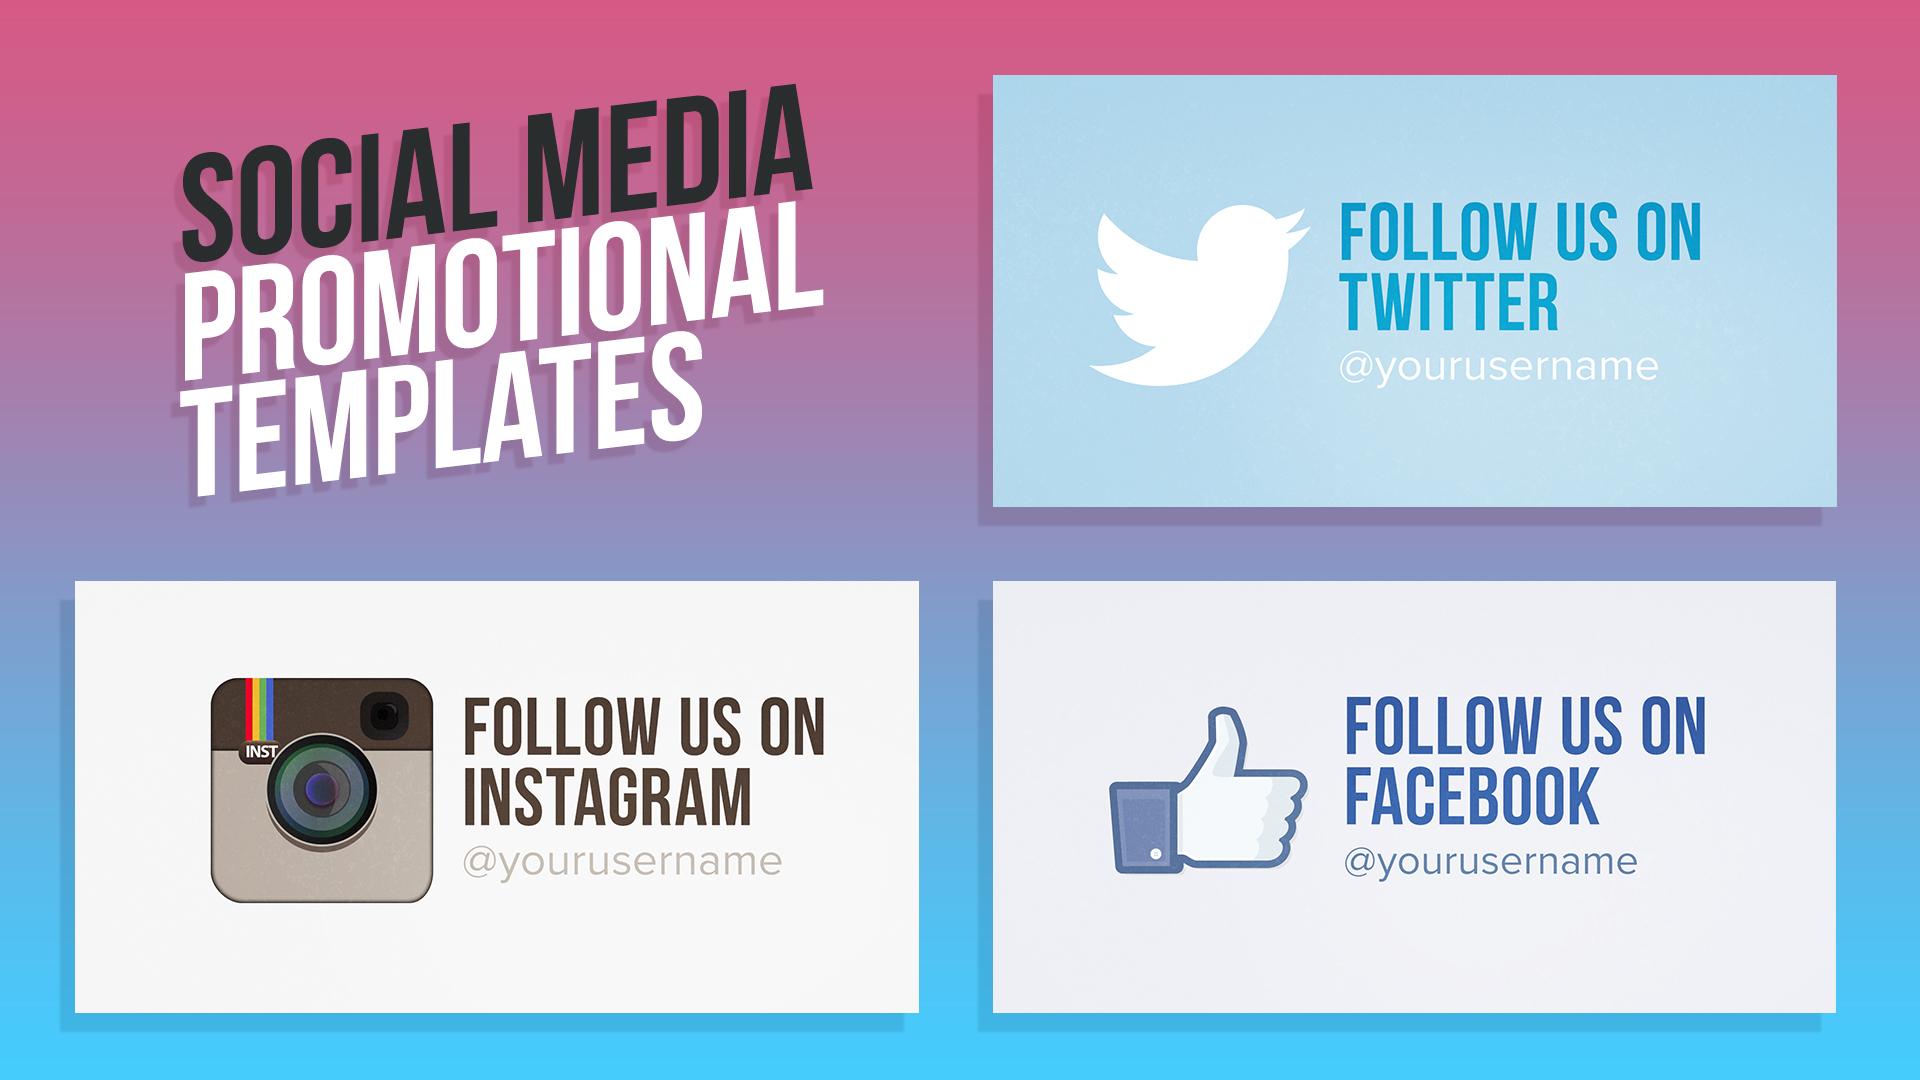 Social Media Promotional Templates